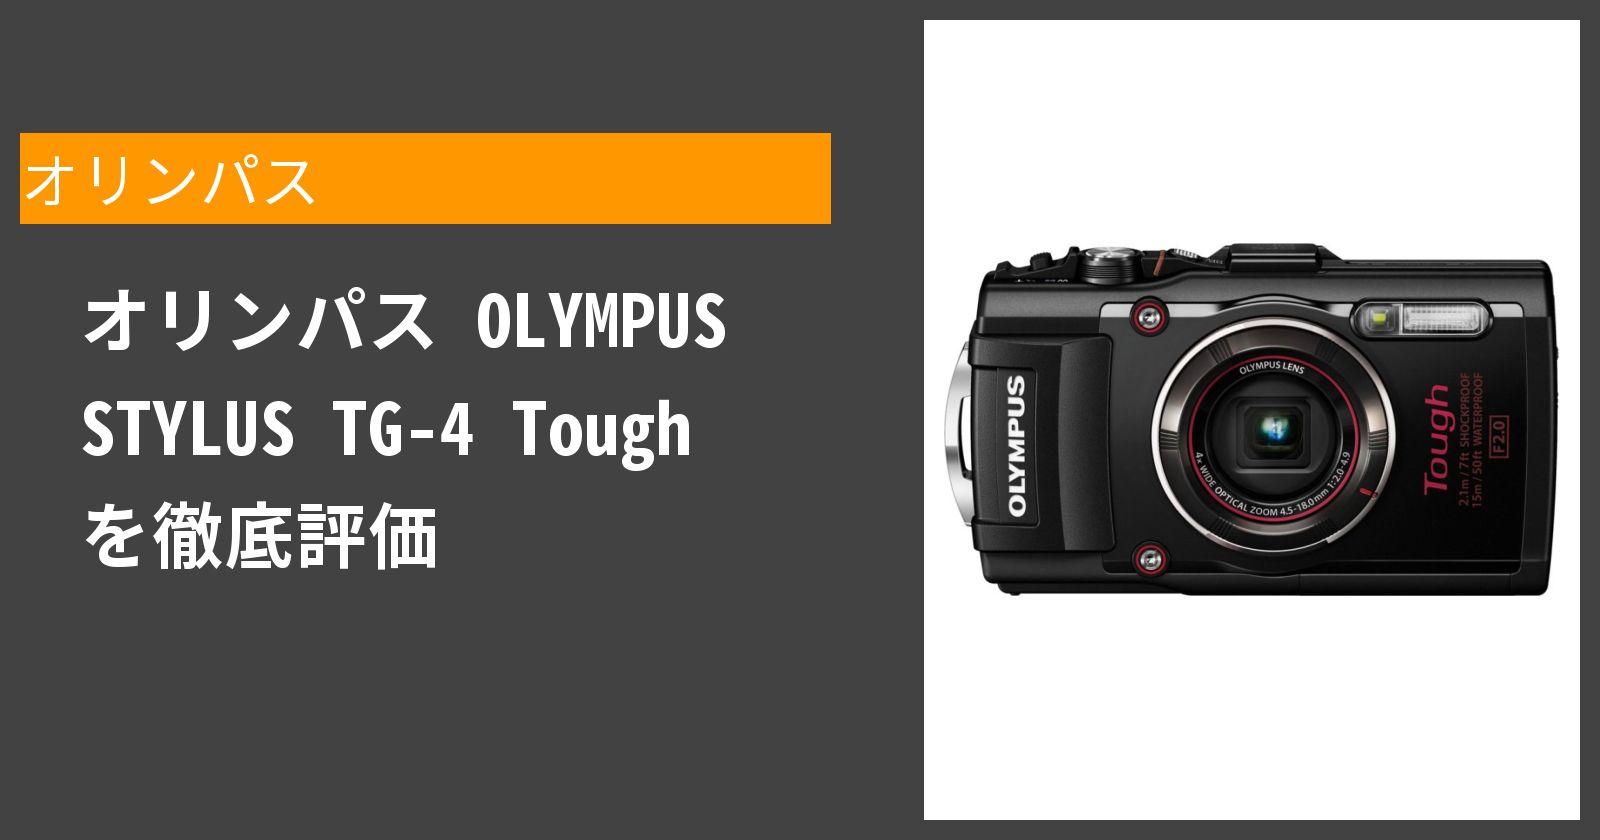 OLYMPUS STYLUS TG-4 Toughを徹底評価